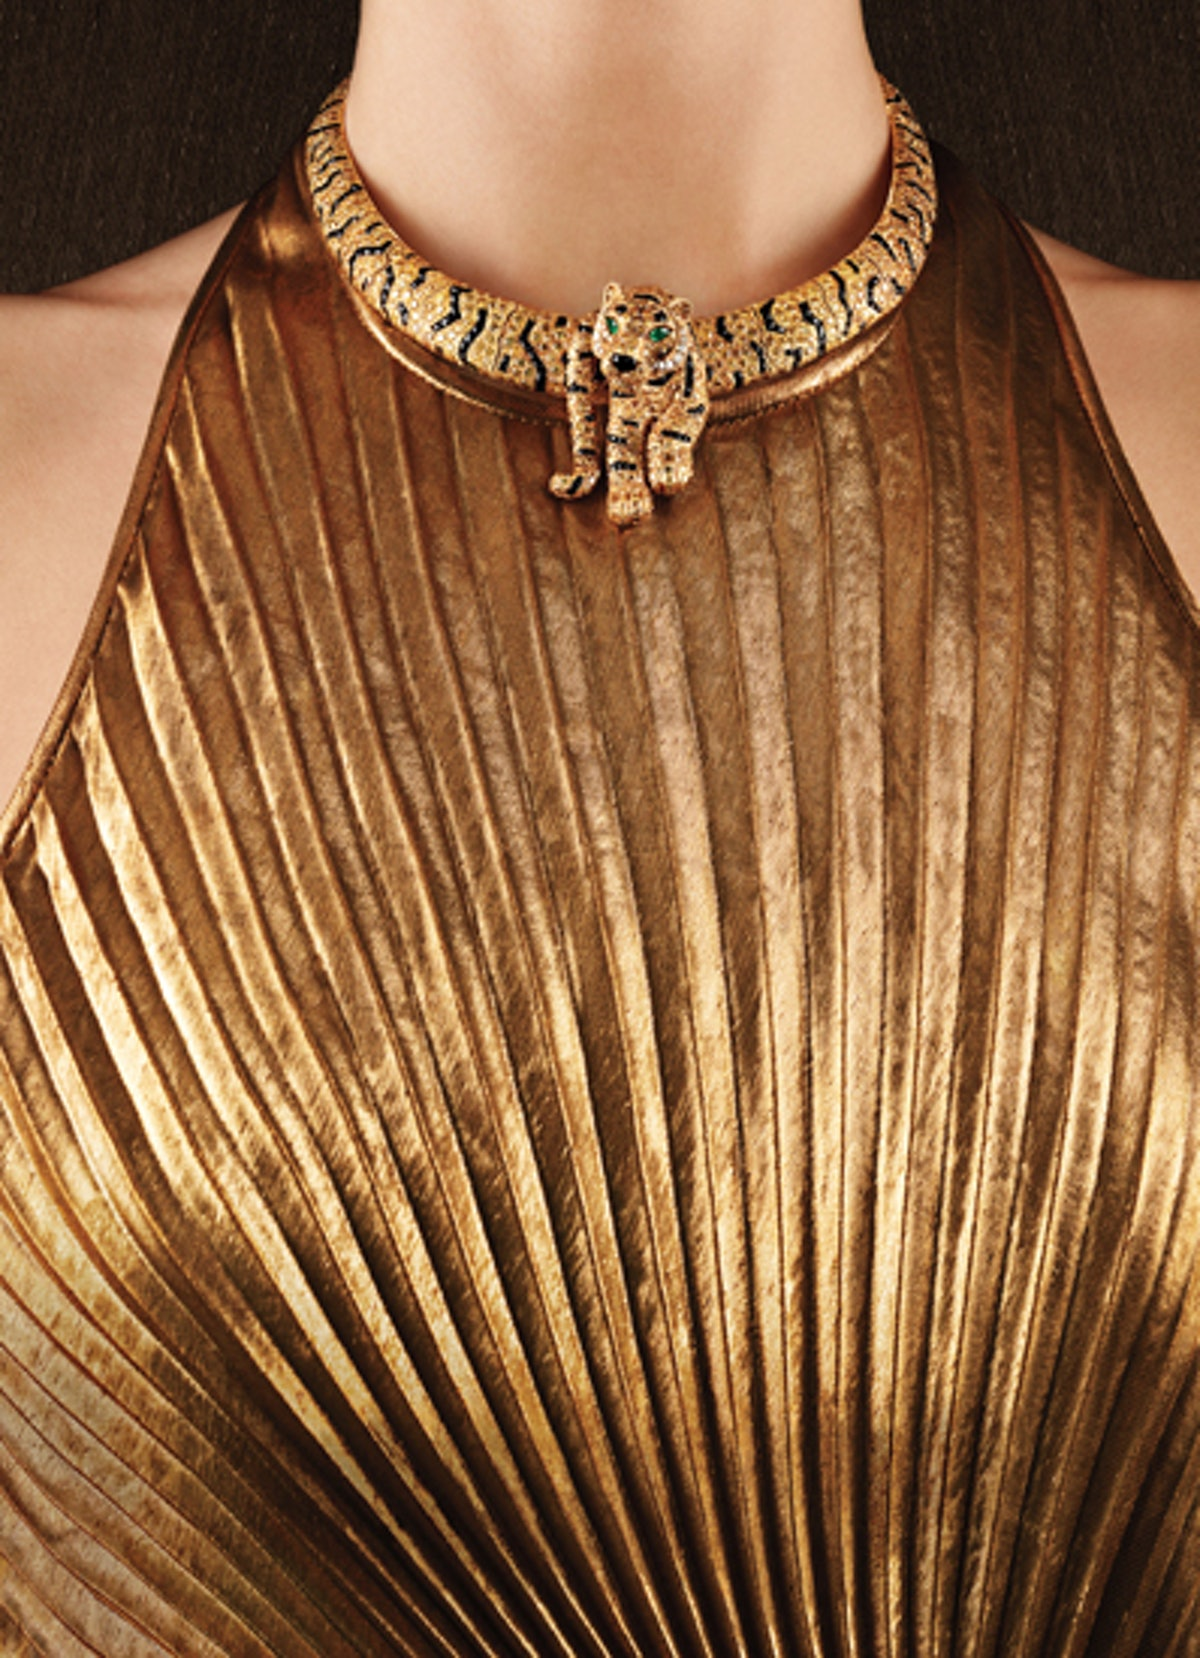 acss-jewelry-decades-03-v.jpg